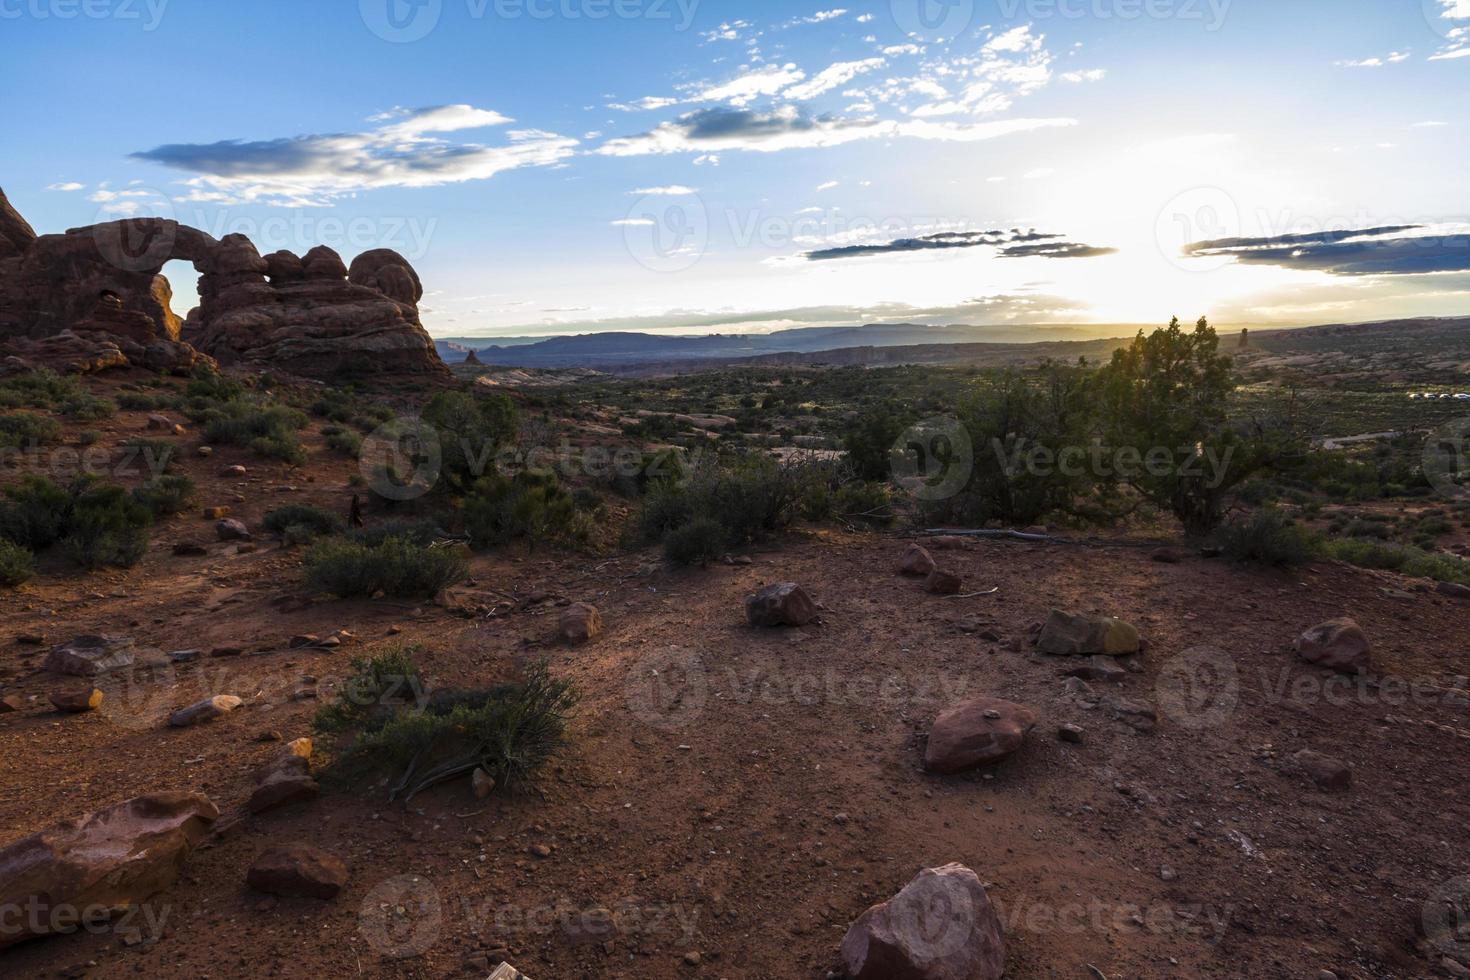 Arches N.P. Desert Landscape in Utah photo